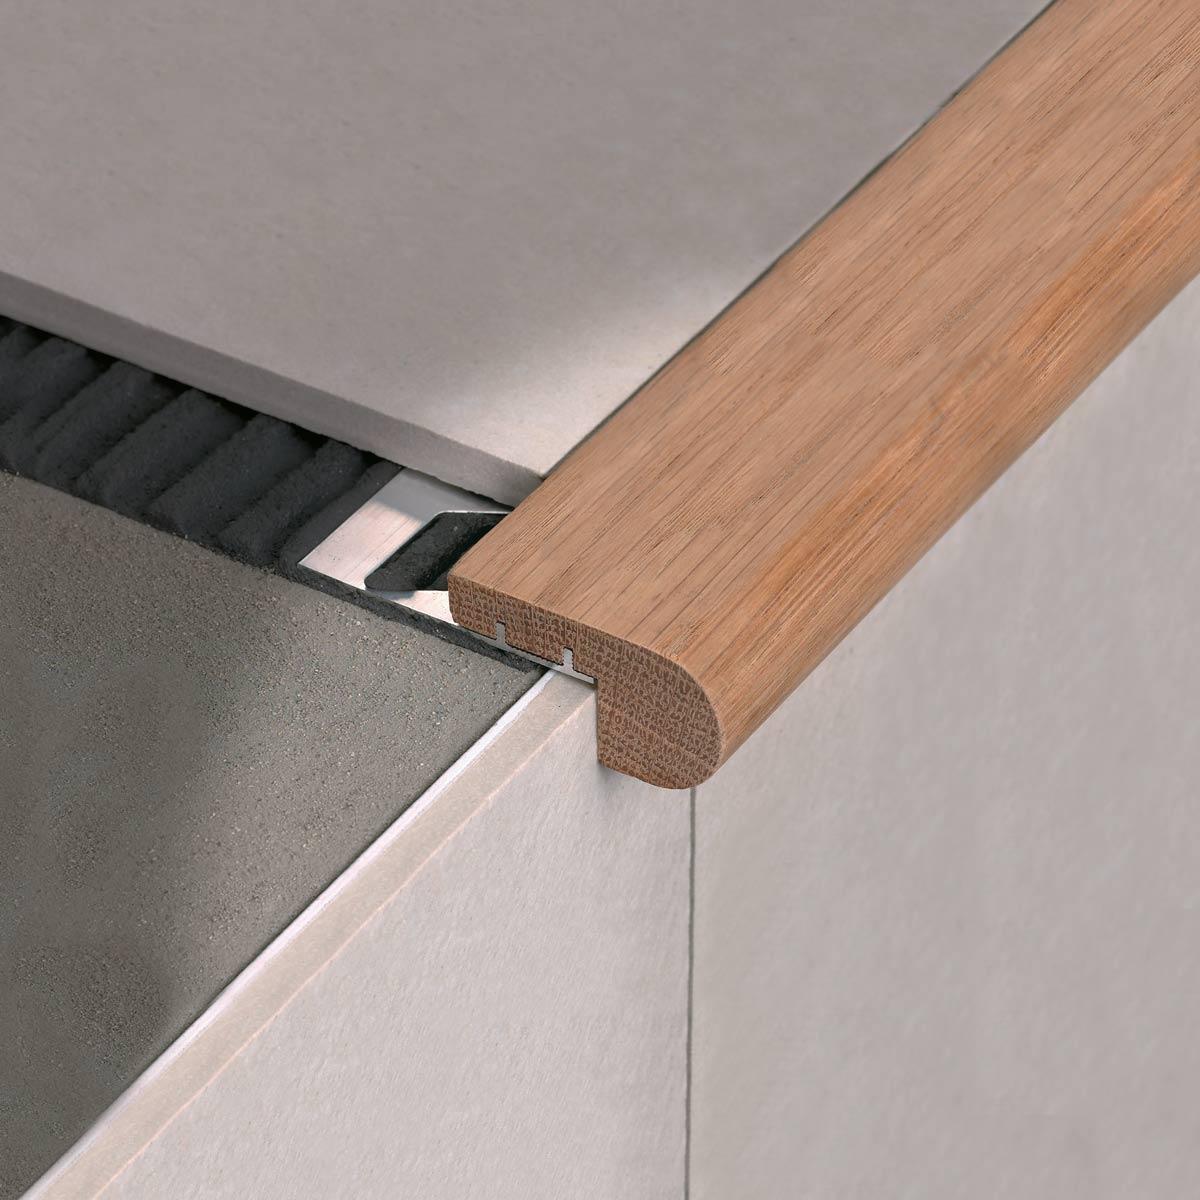 Profili per gradini Stairtec FW RON Profilitec